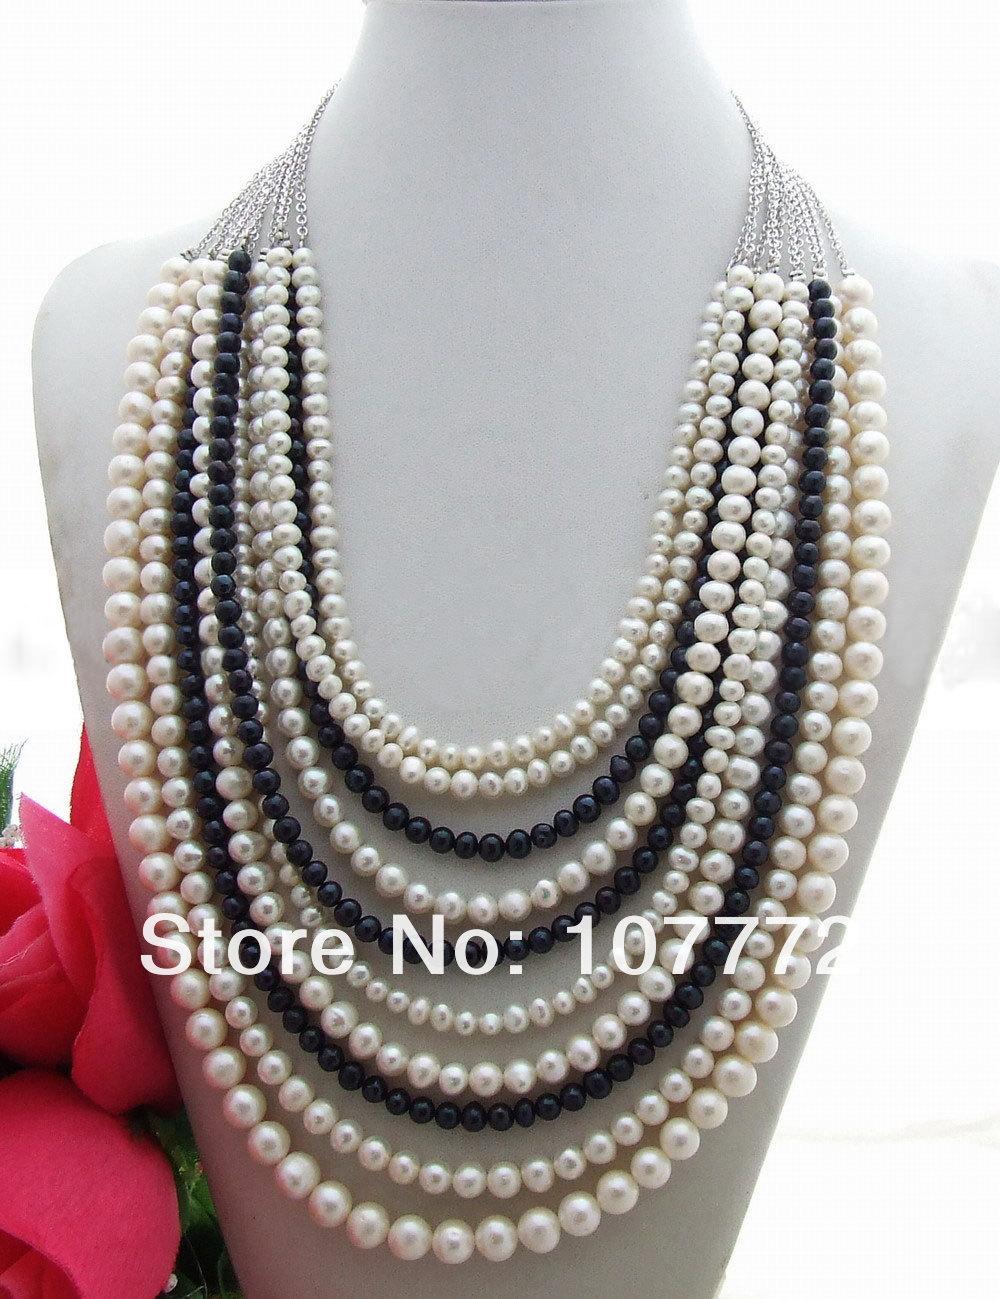 10 Strands Pearl Necklace10 Strands Pearl Necklace